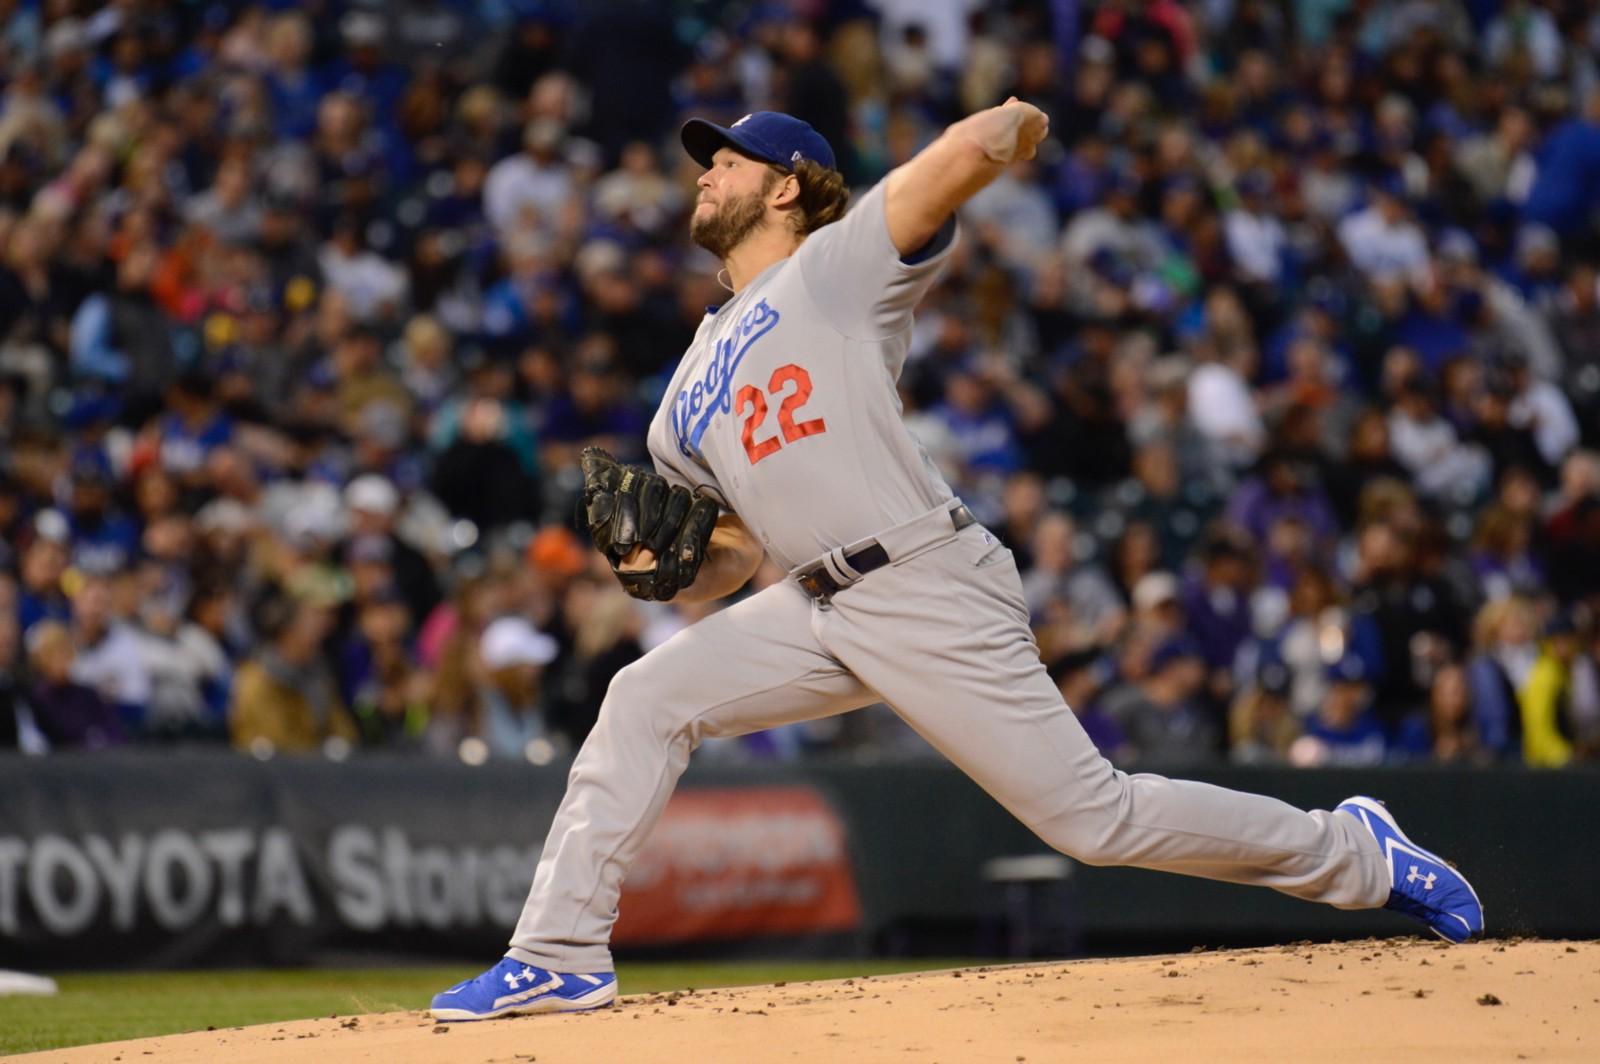 Image Credit: Matt Kelley/MLB.com